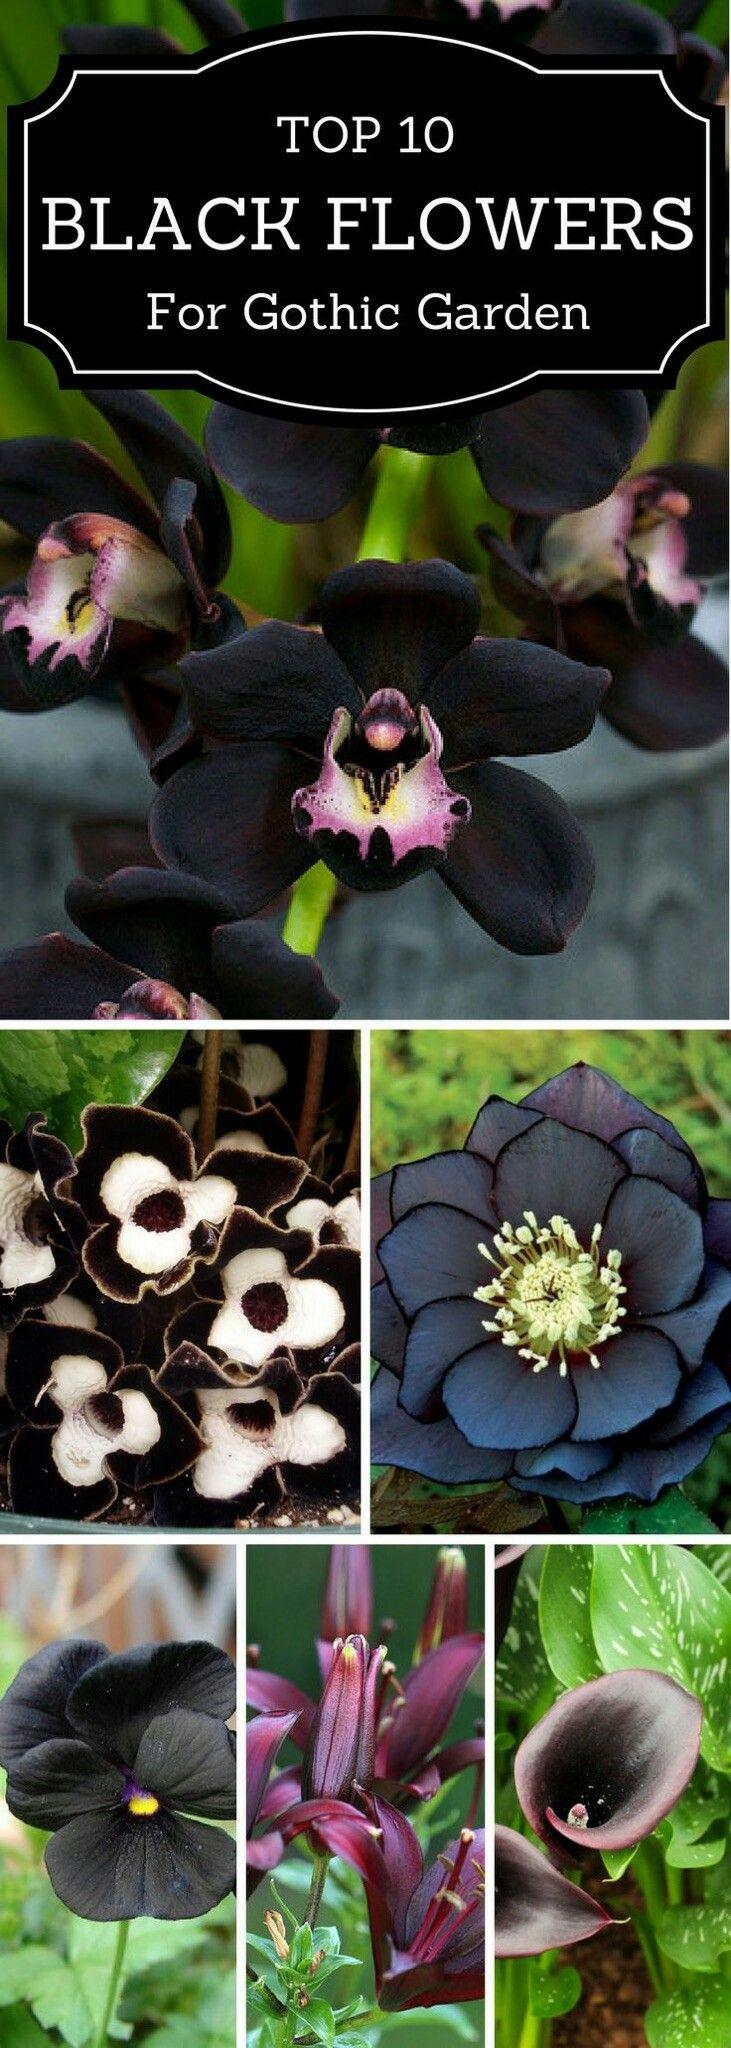 Top 10 Black Flowers for Gothic Garden